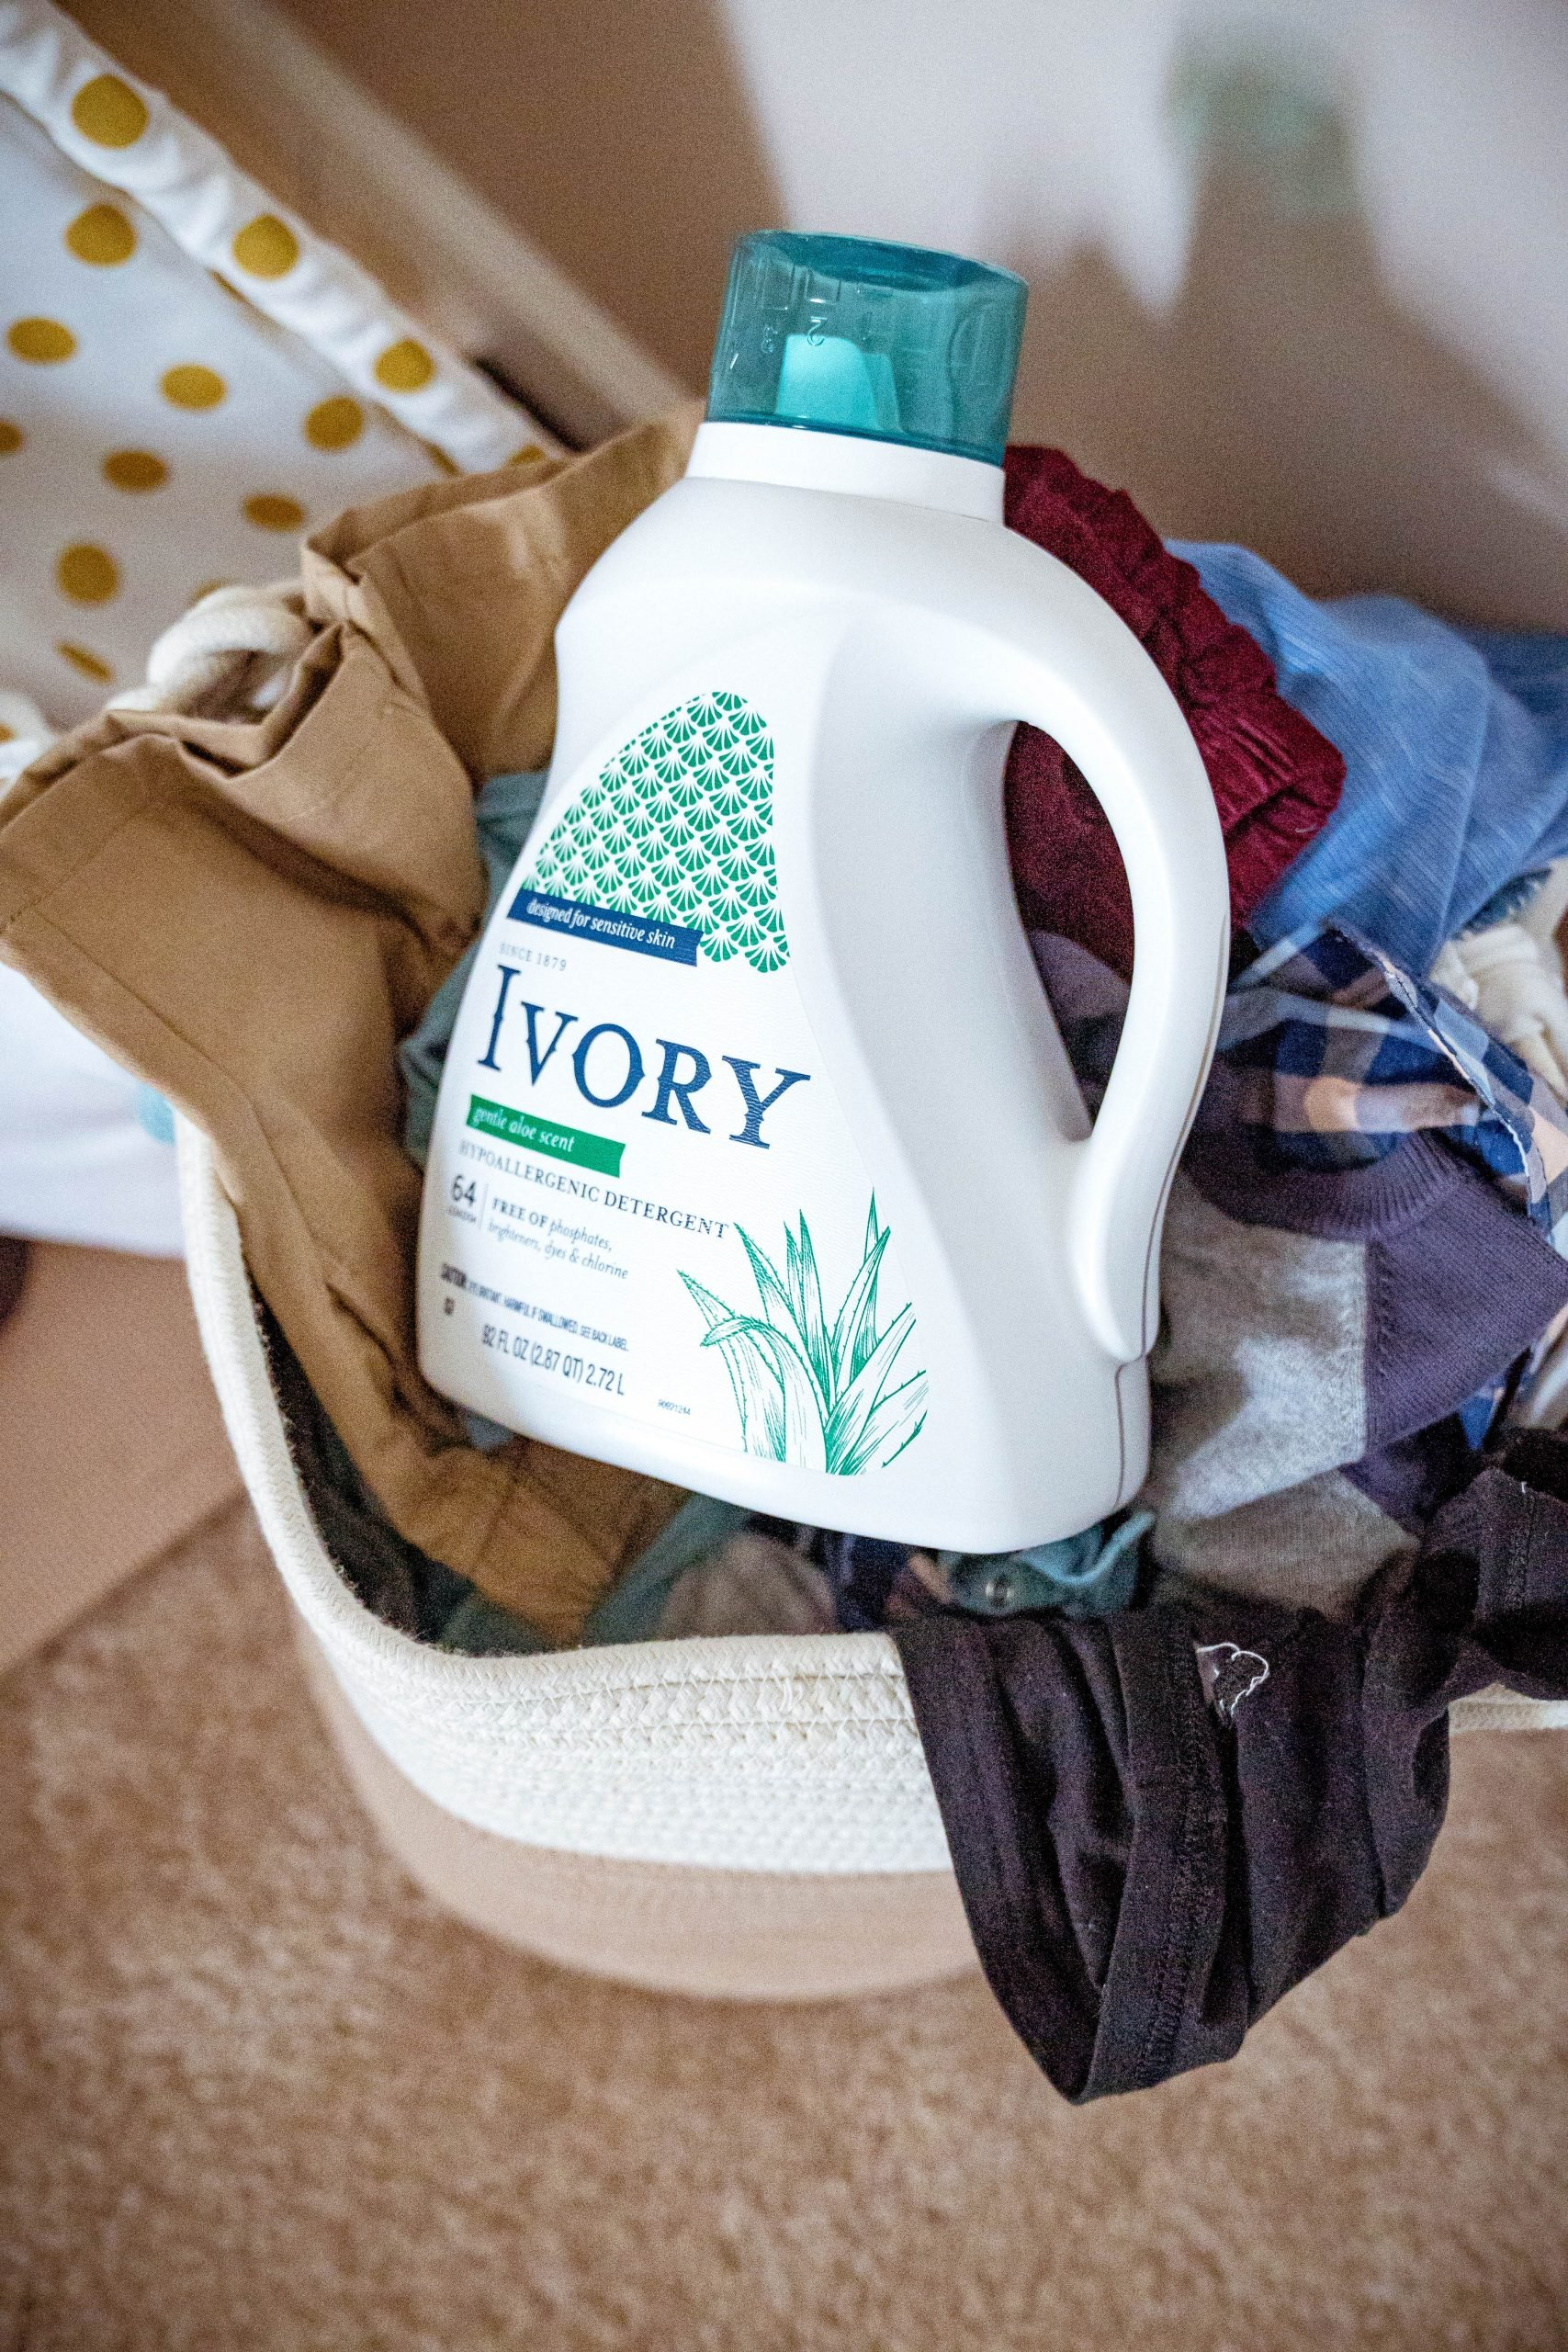 LivingLesh using ivory laundry detergent